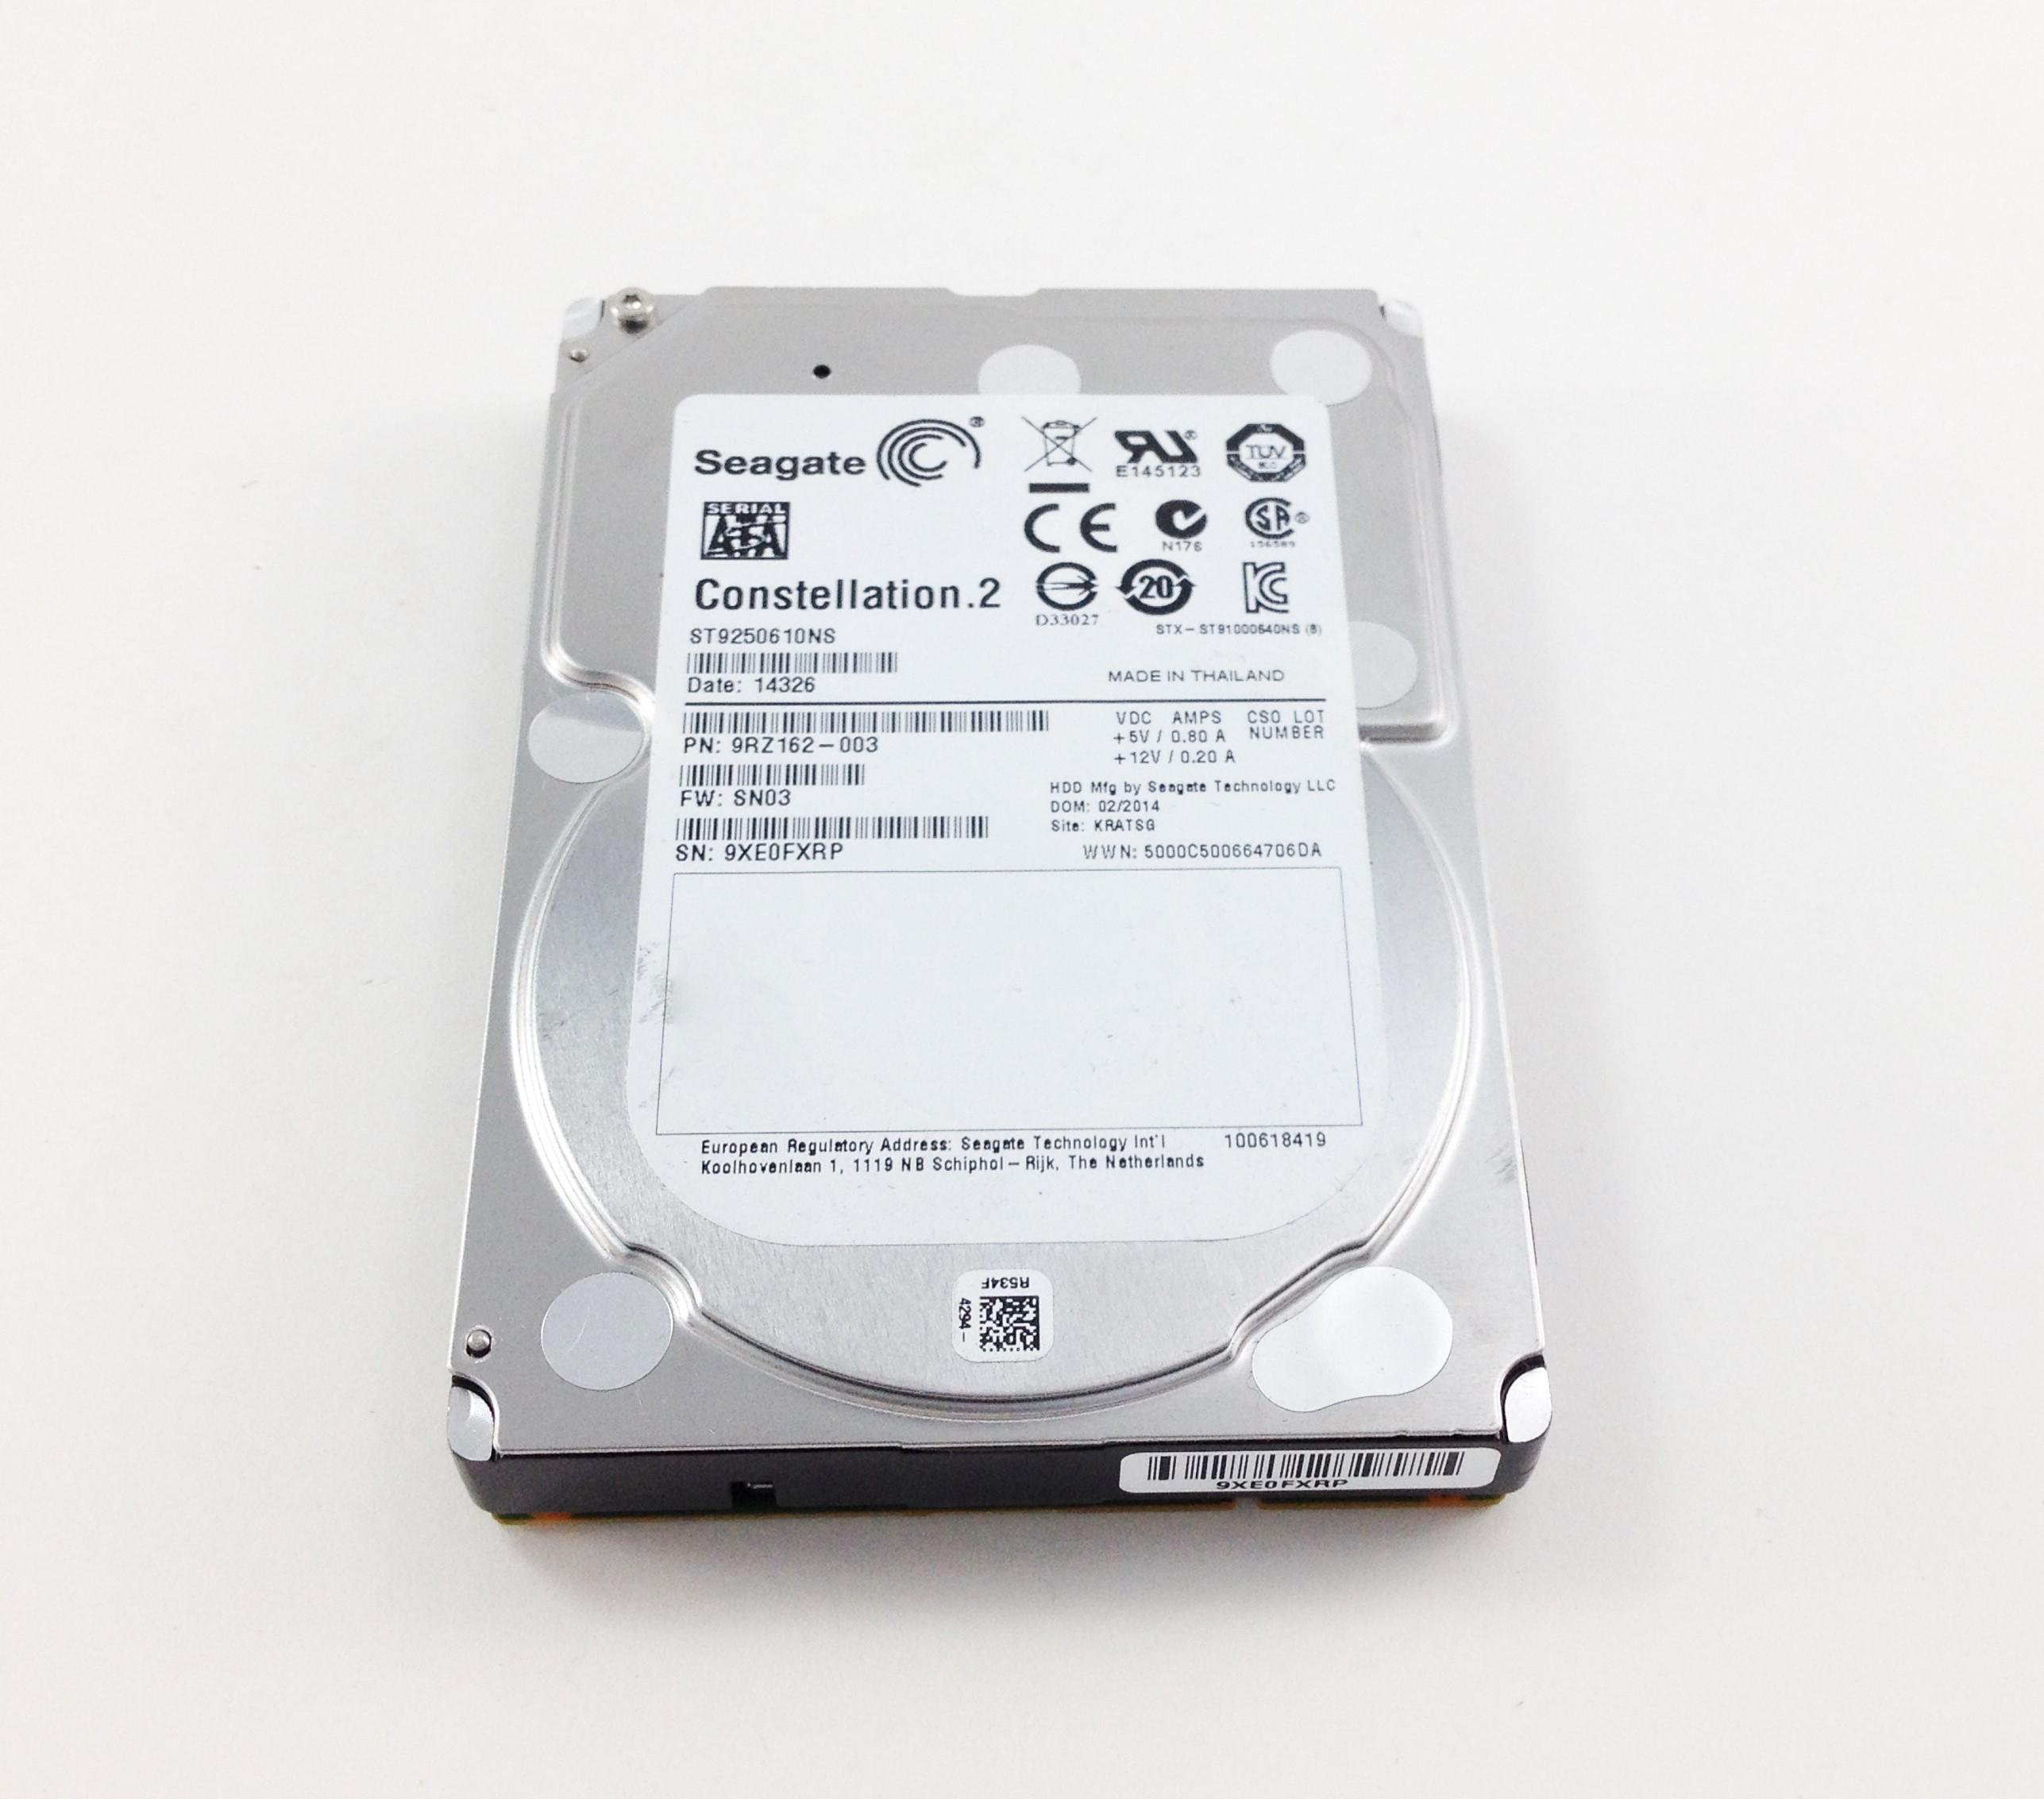 SEAGATE 250GB 7.2K 6GbPS SATA 2.5'' HARD DRIVE (ST9250610NS)